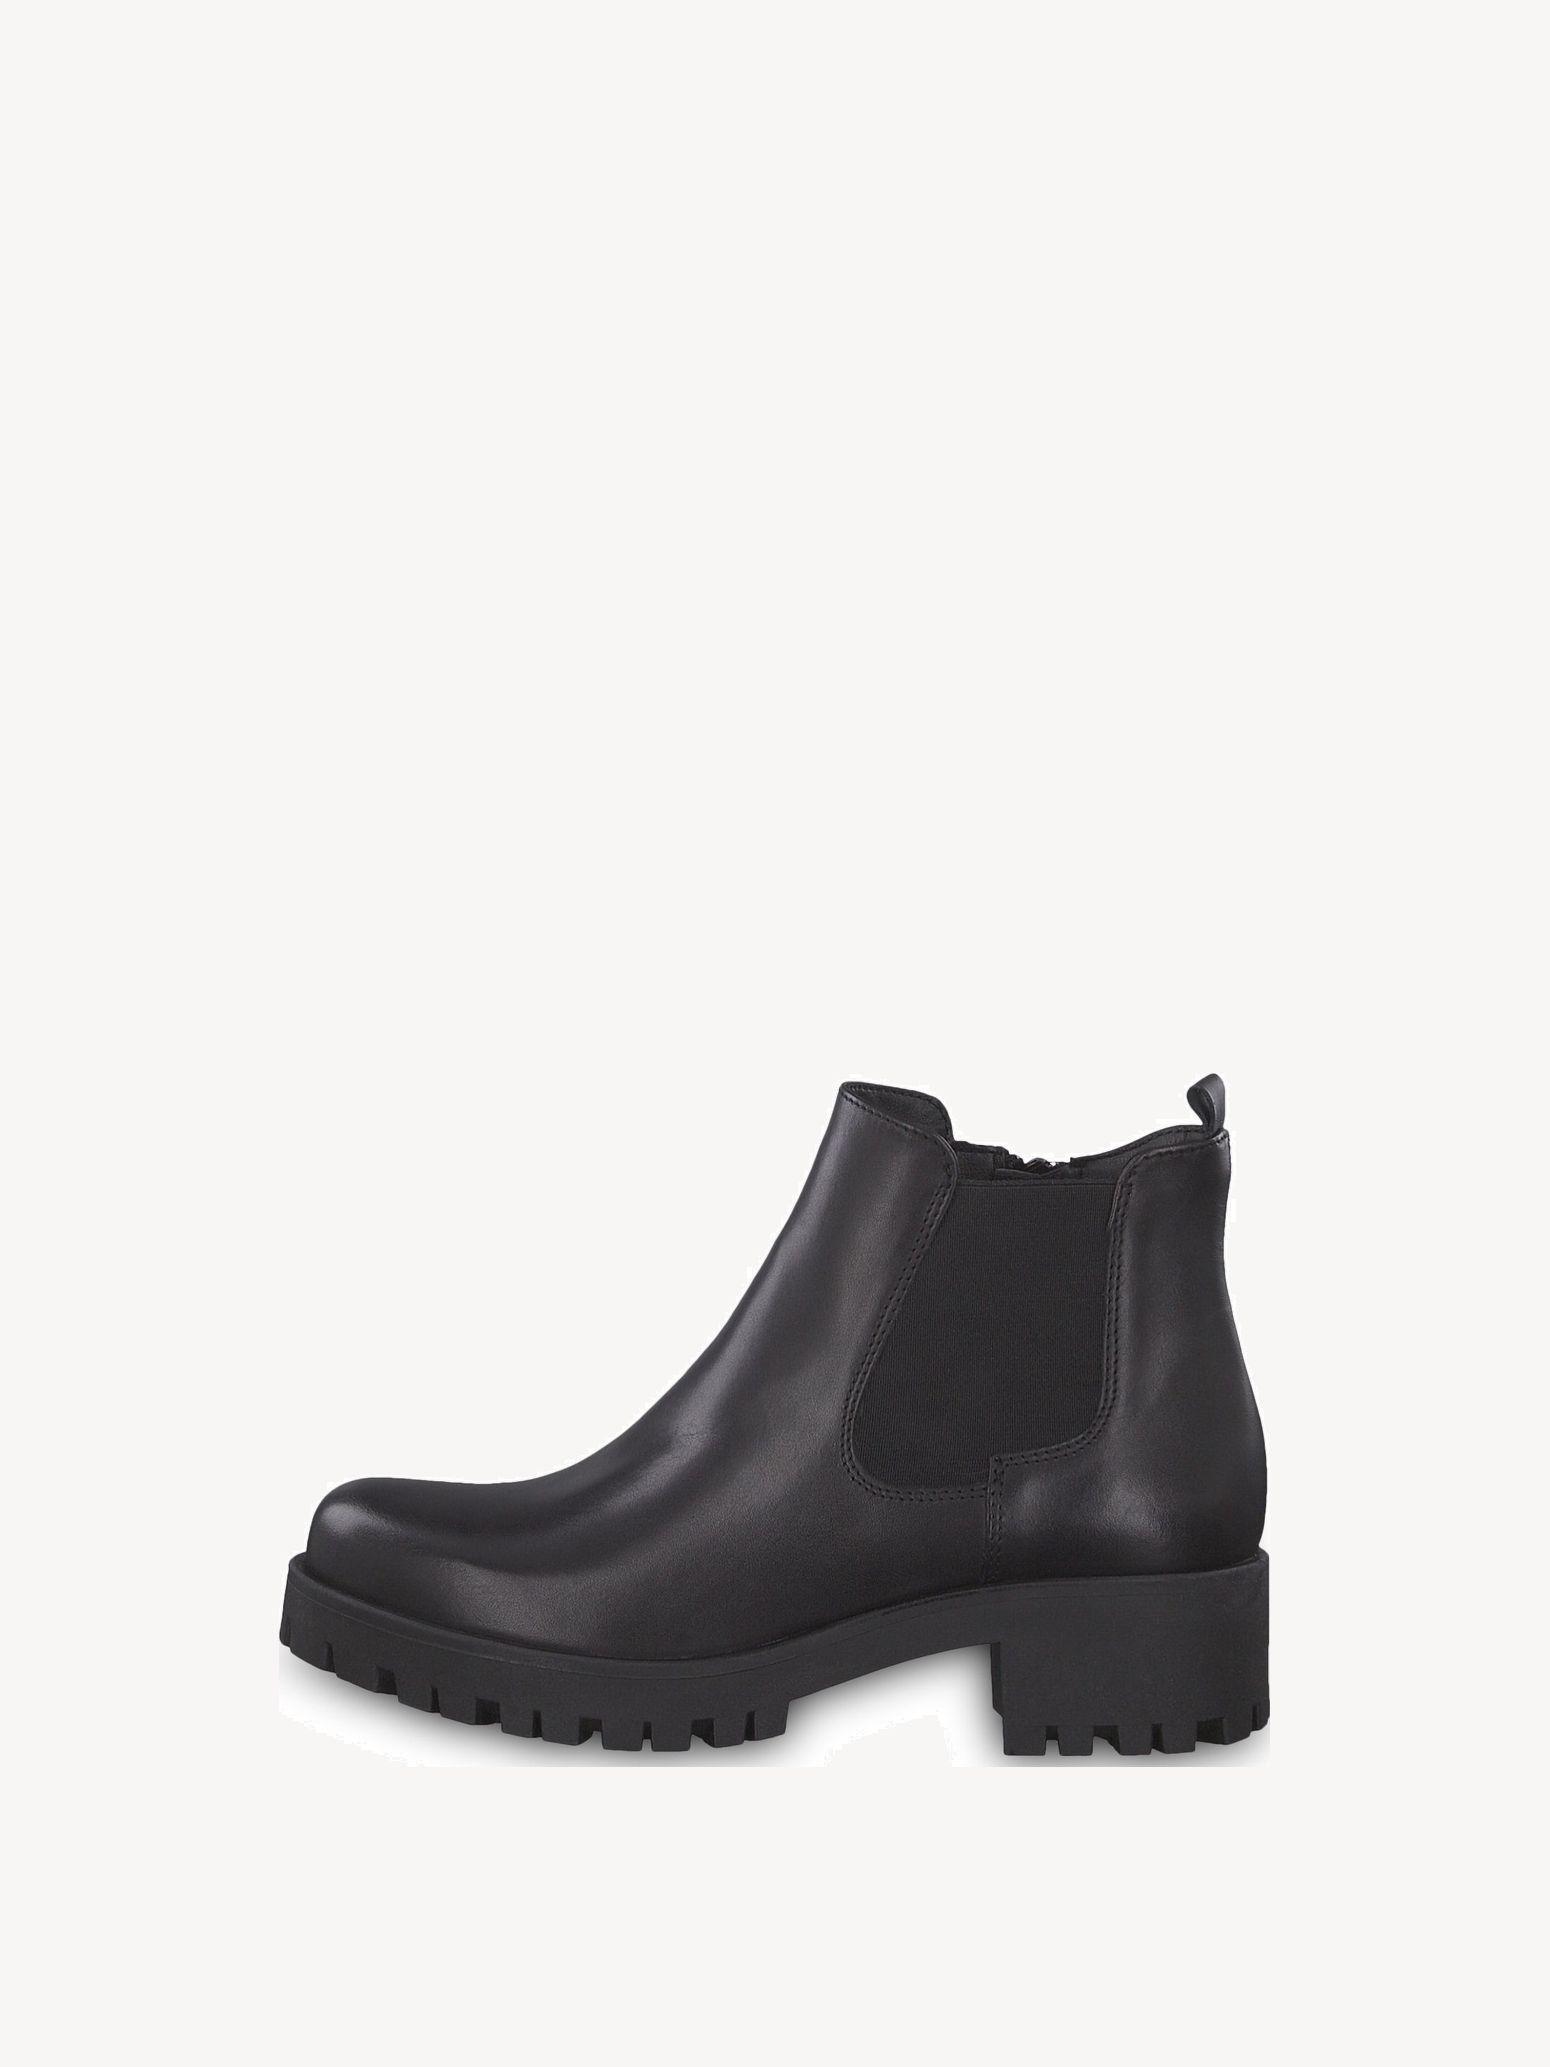 TAMARIS Women Chelsea Boot Cocco schwarz 40